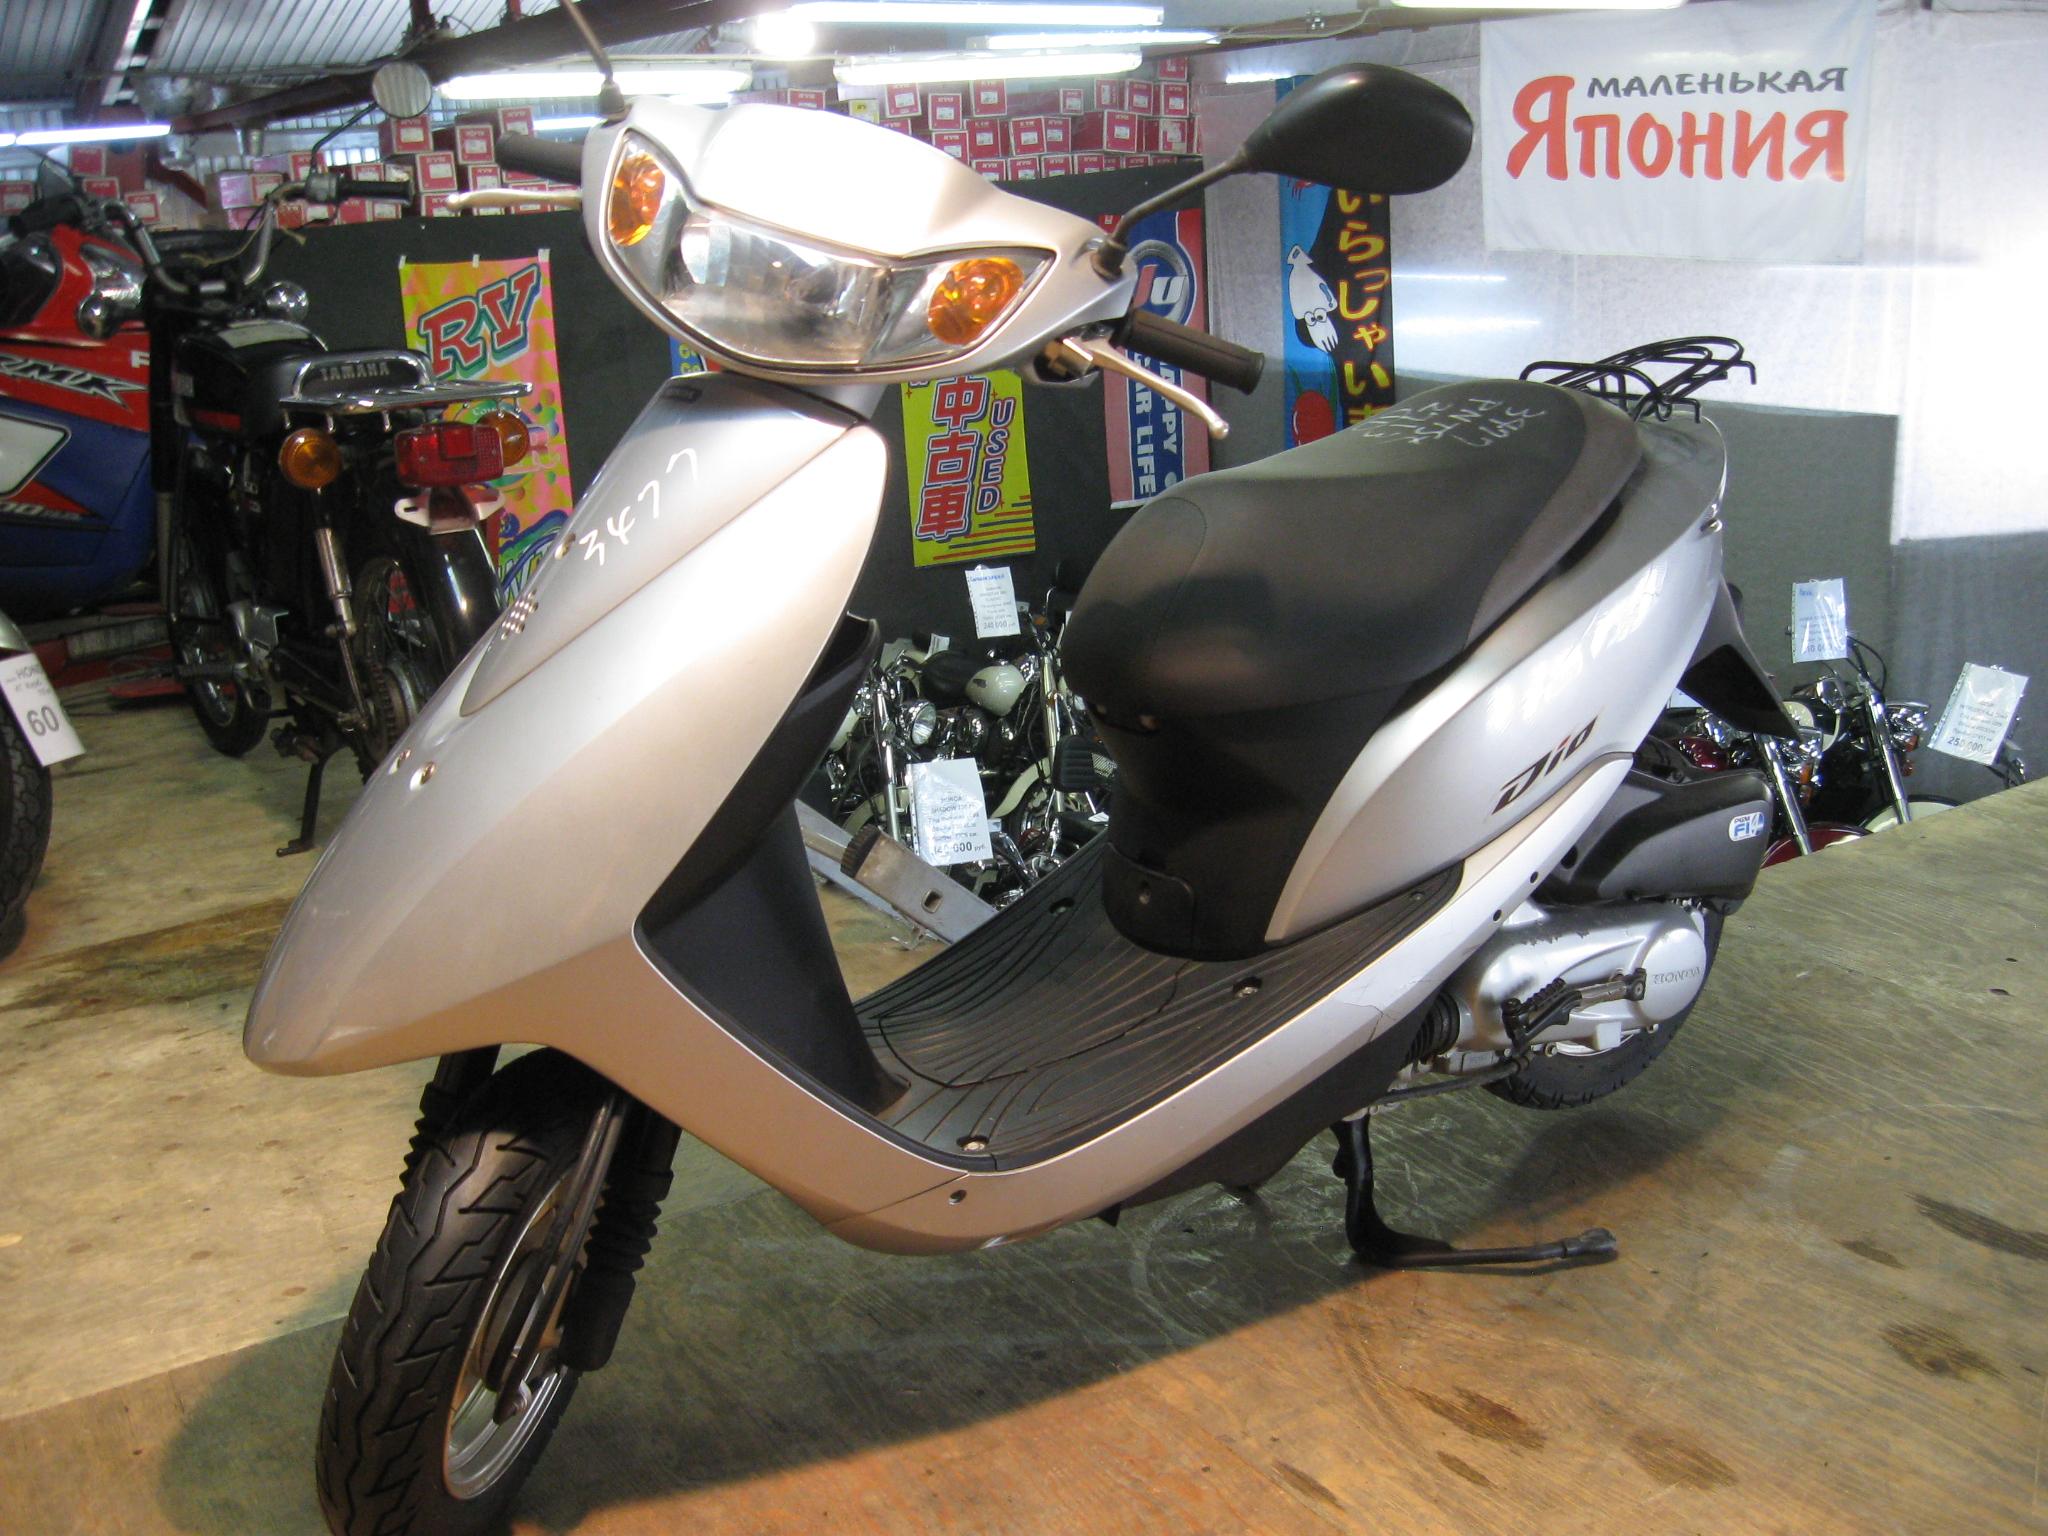 Макси скутер Yamaha Cygnus X 125: Продажа скутеров Ямаха ...